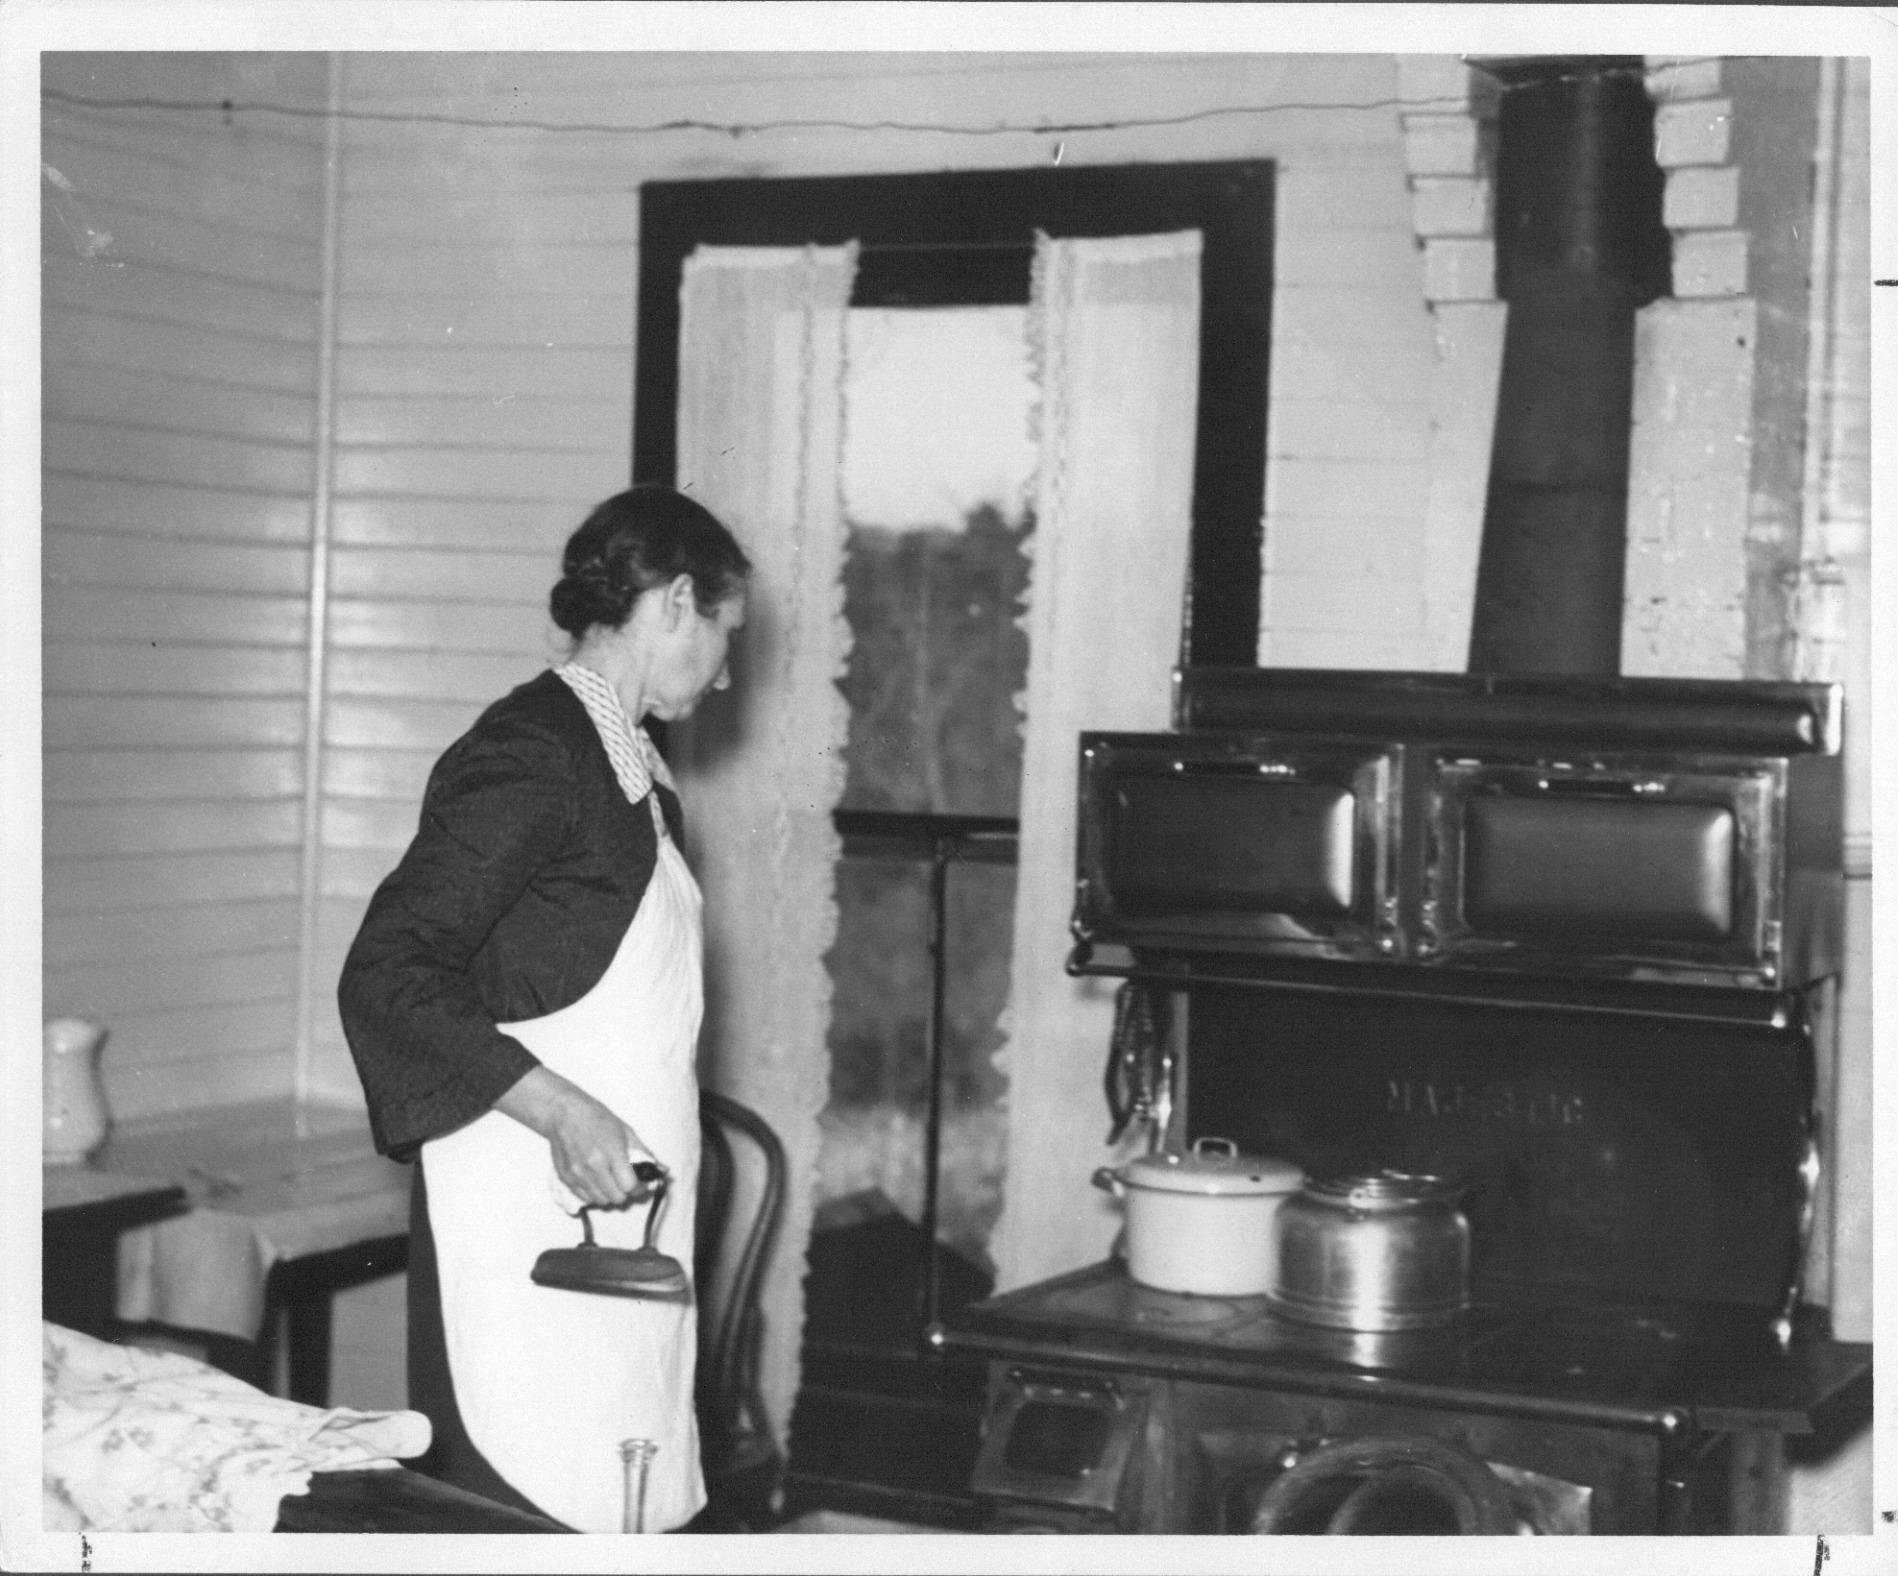 warming iron on stove